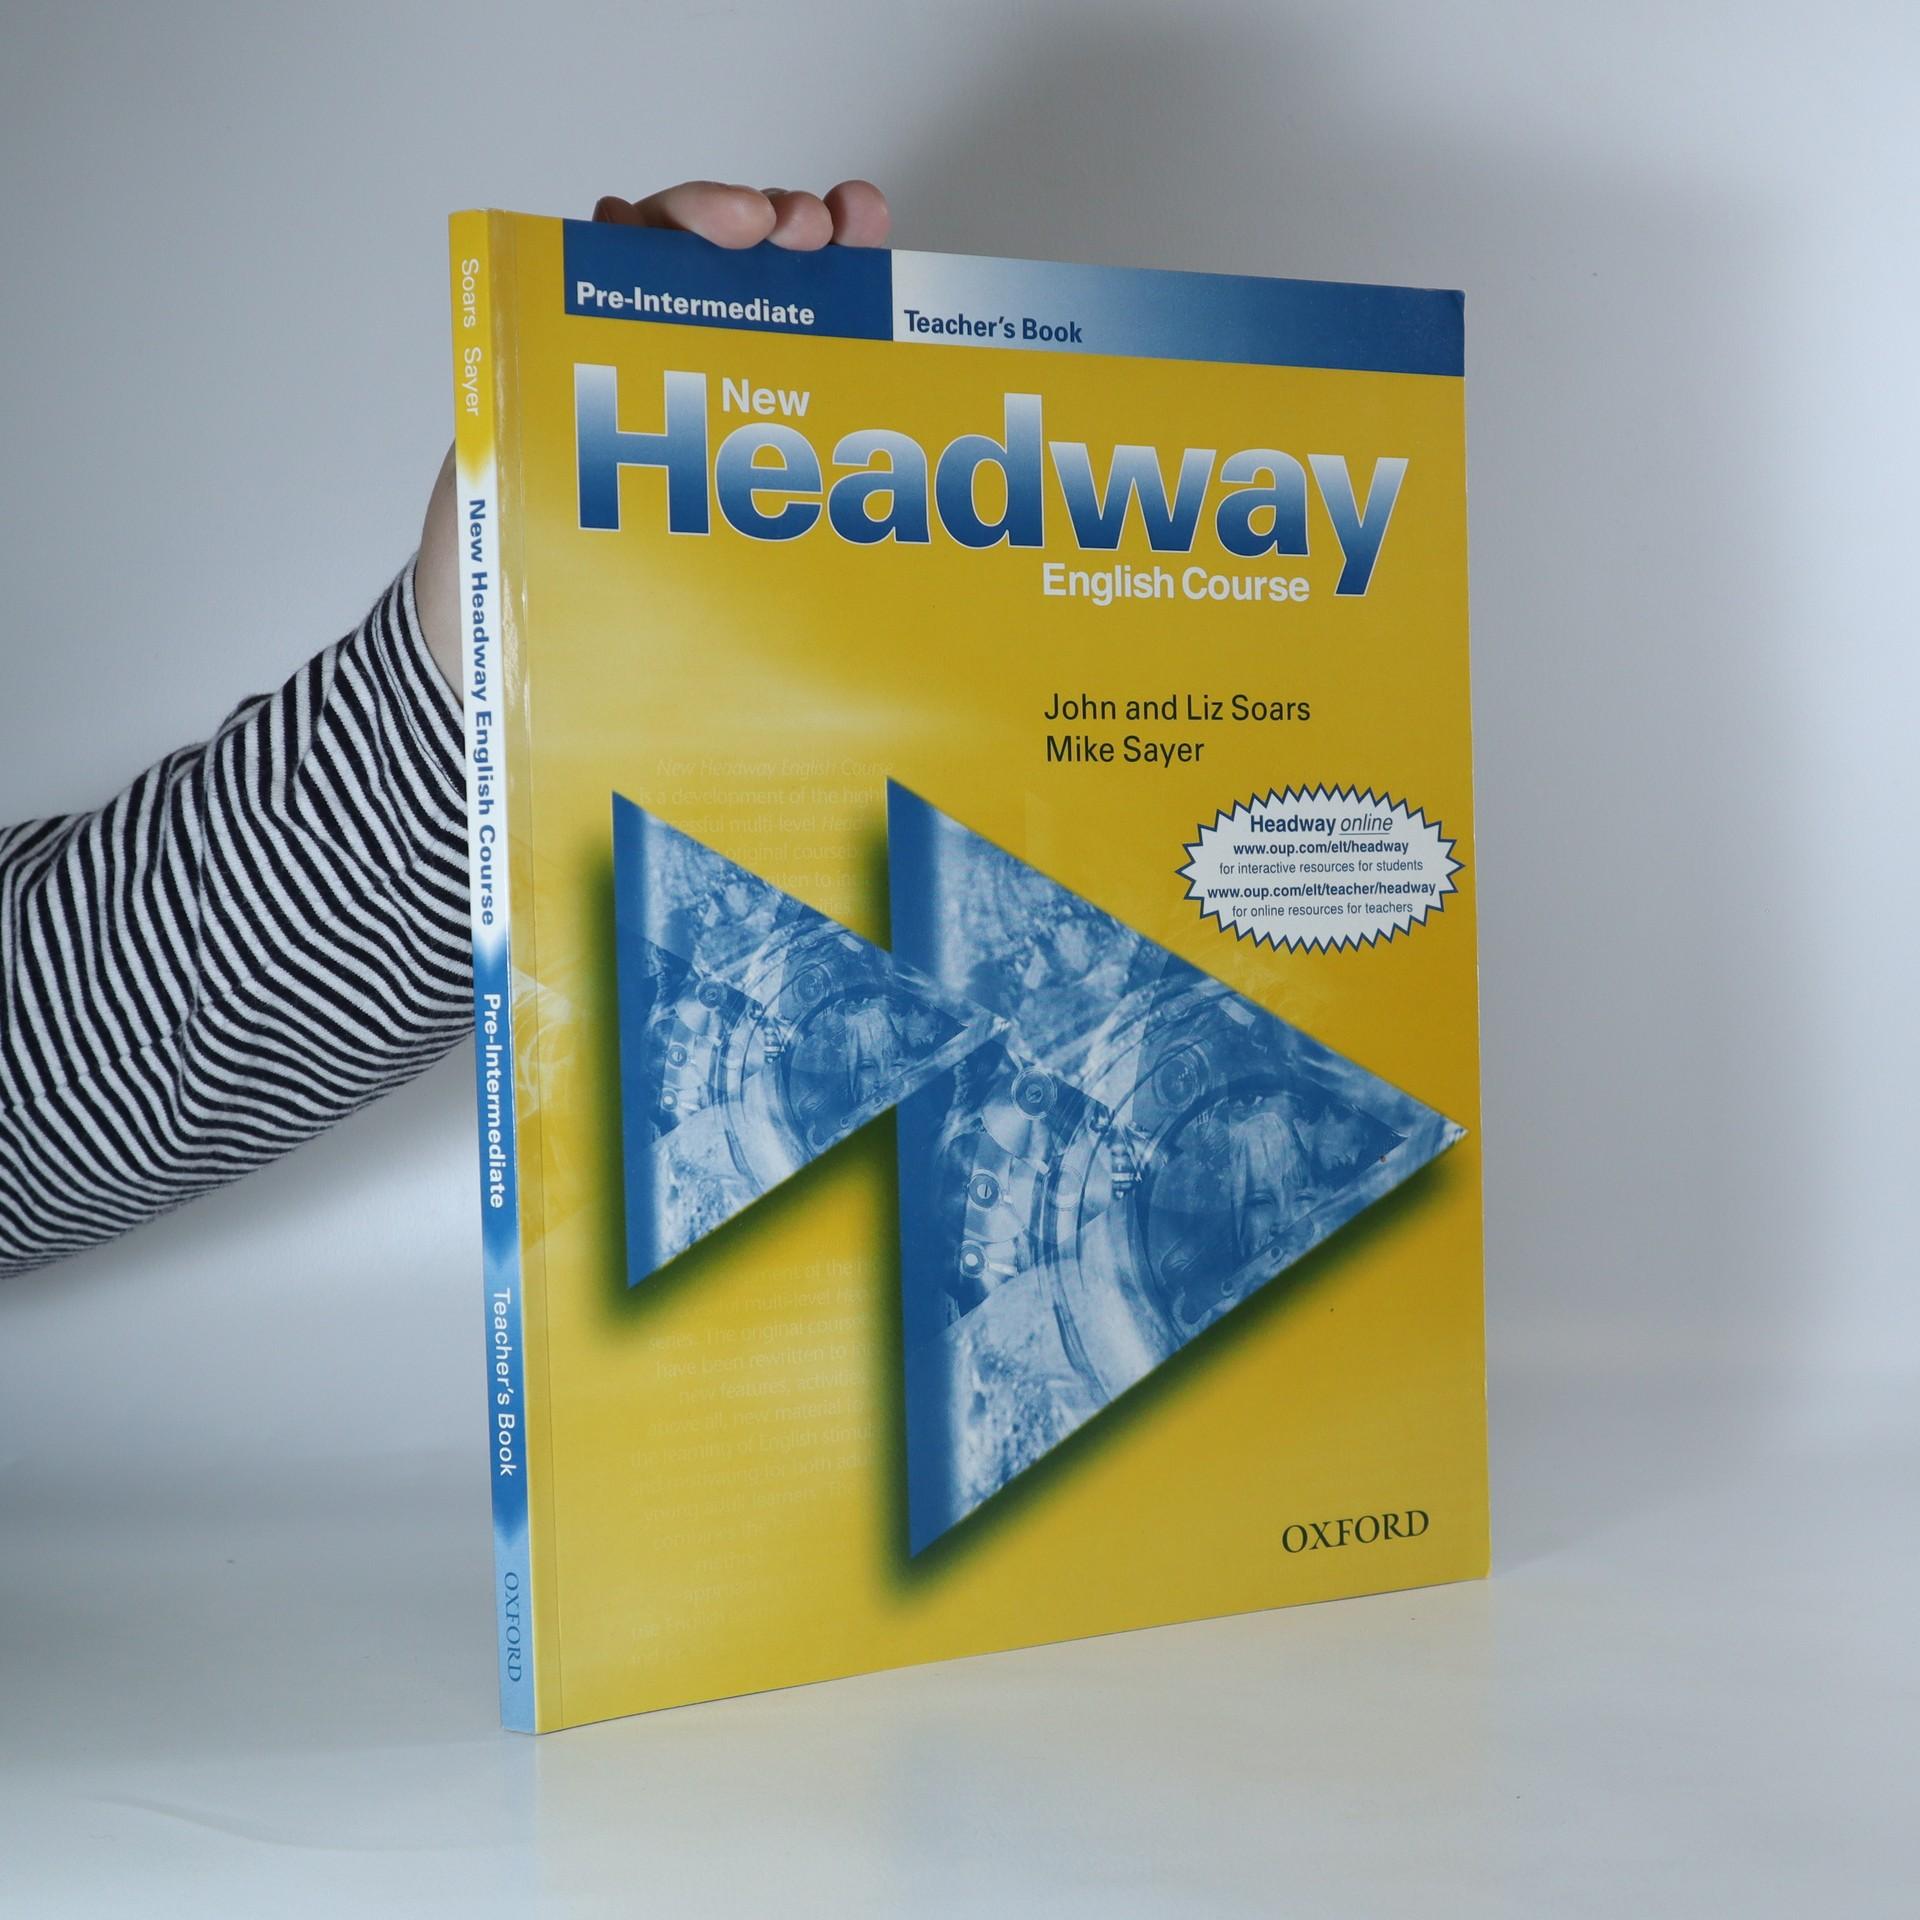 antikvární kniha New Headway English Course. Pre-Intermediate. Teacher's Book., 2004